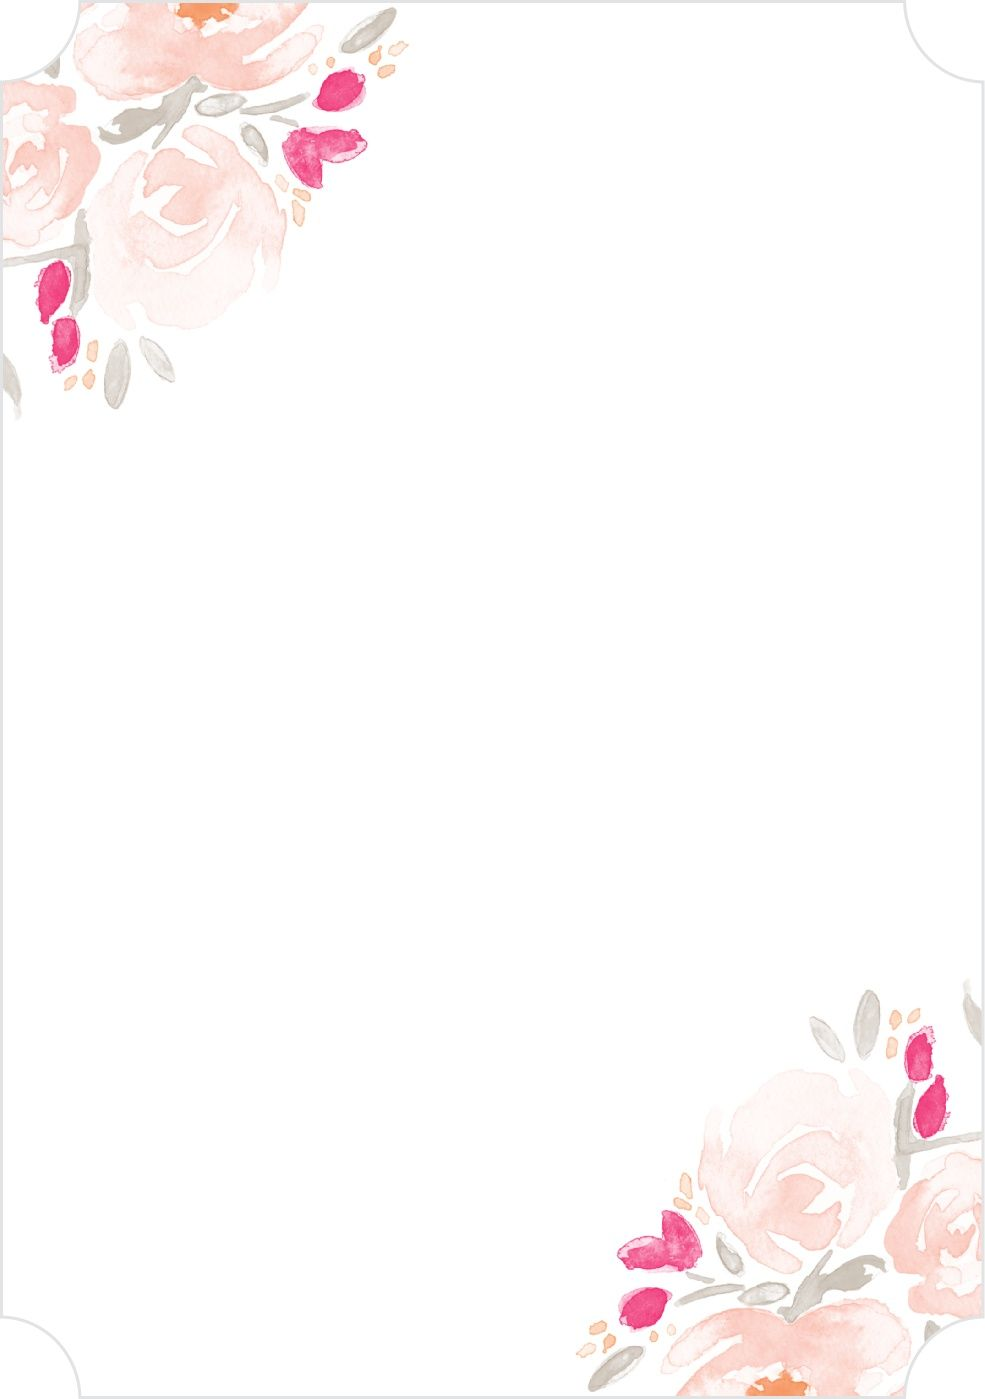 Pin De Faisaleh Em Quincenera Molduras Para Convites De Casamento Ilustracoes Florais Convite De Casamento